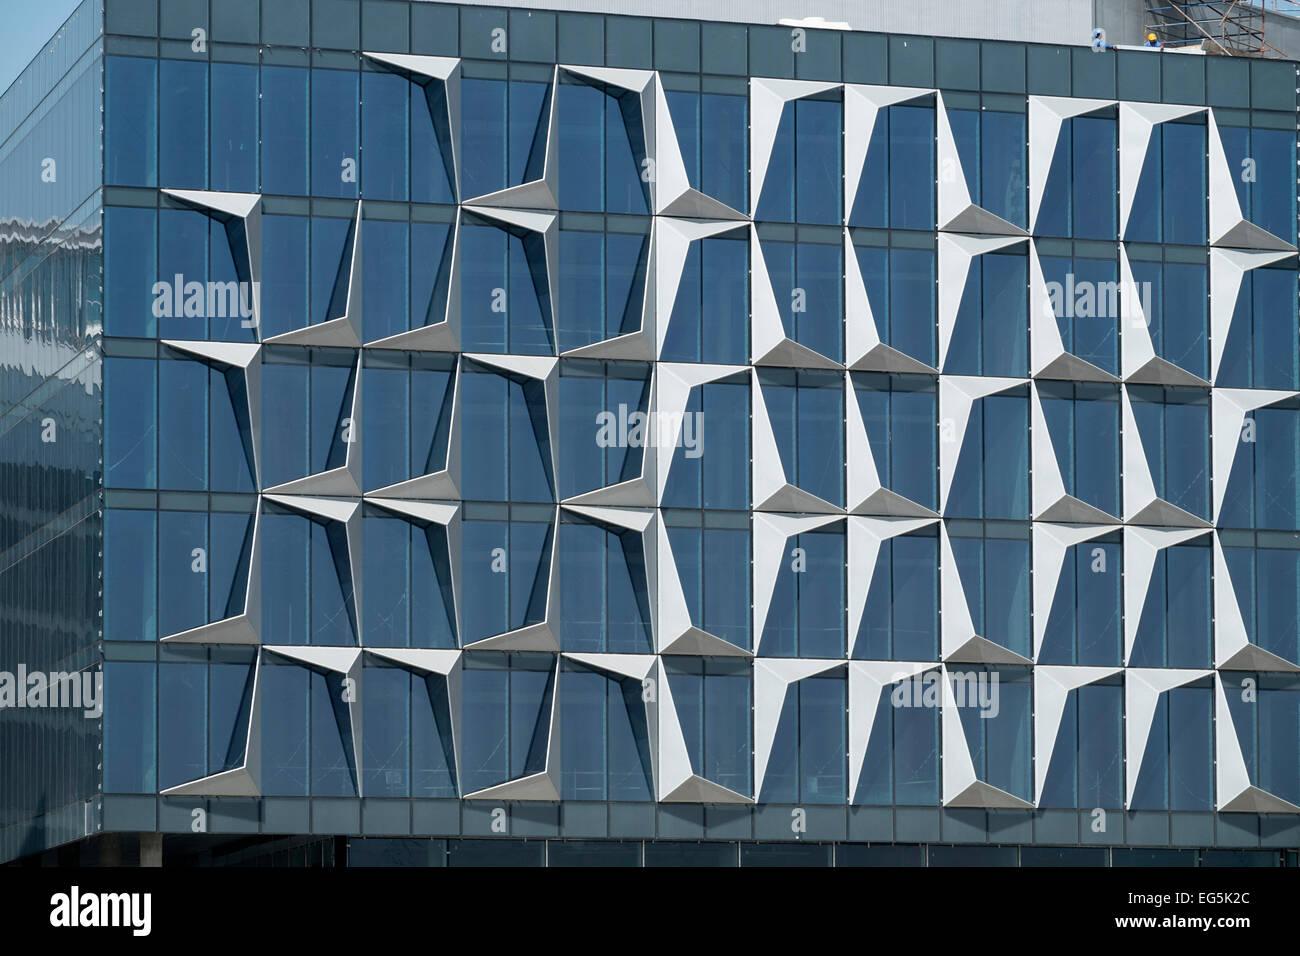 Detail of architecture of windows at new dubai design for Windows 8 architecture